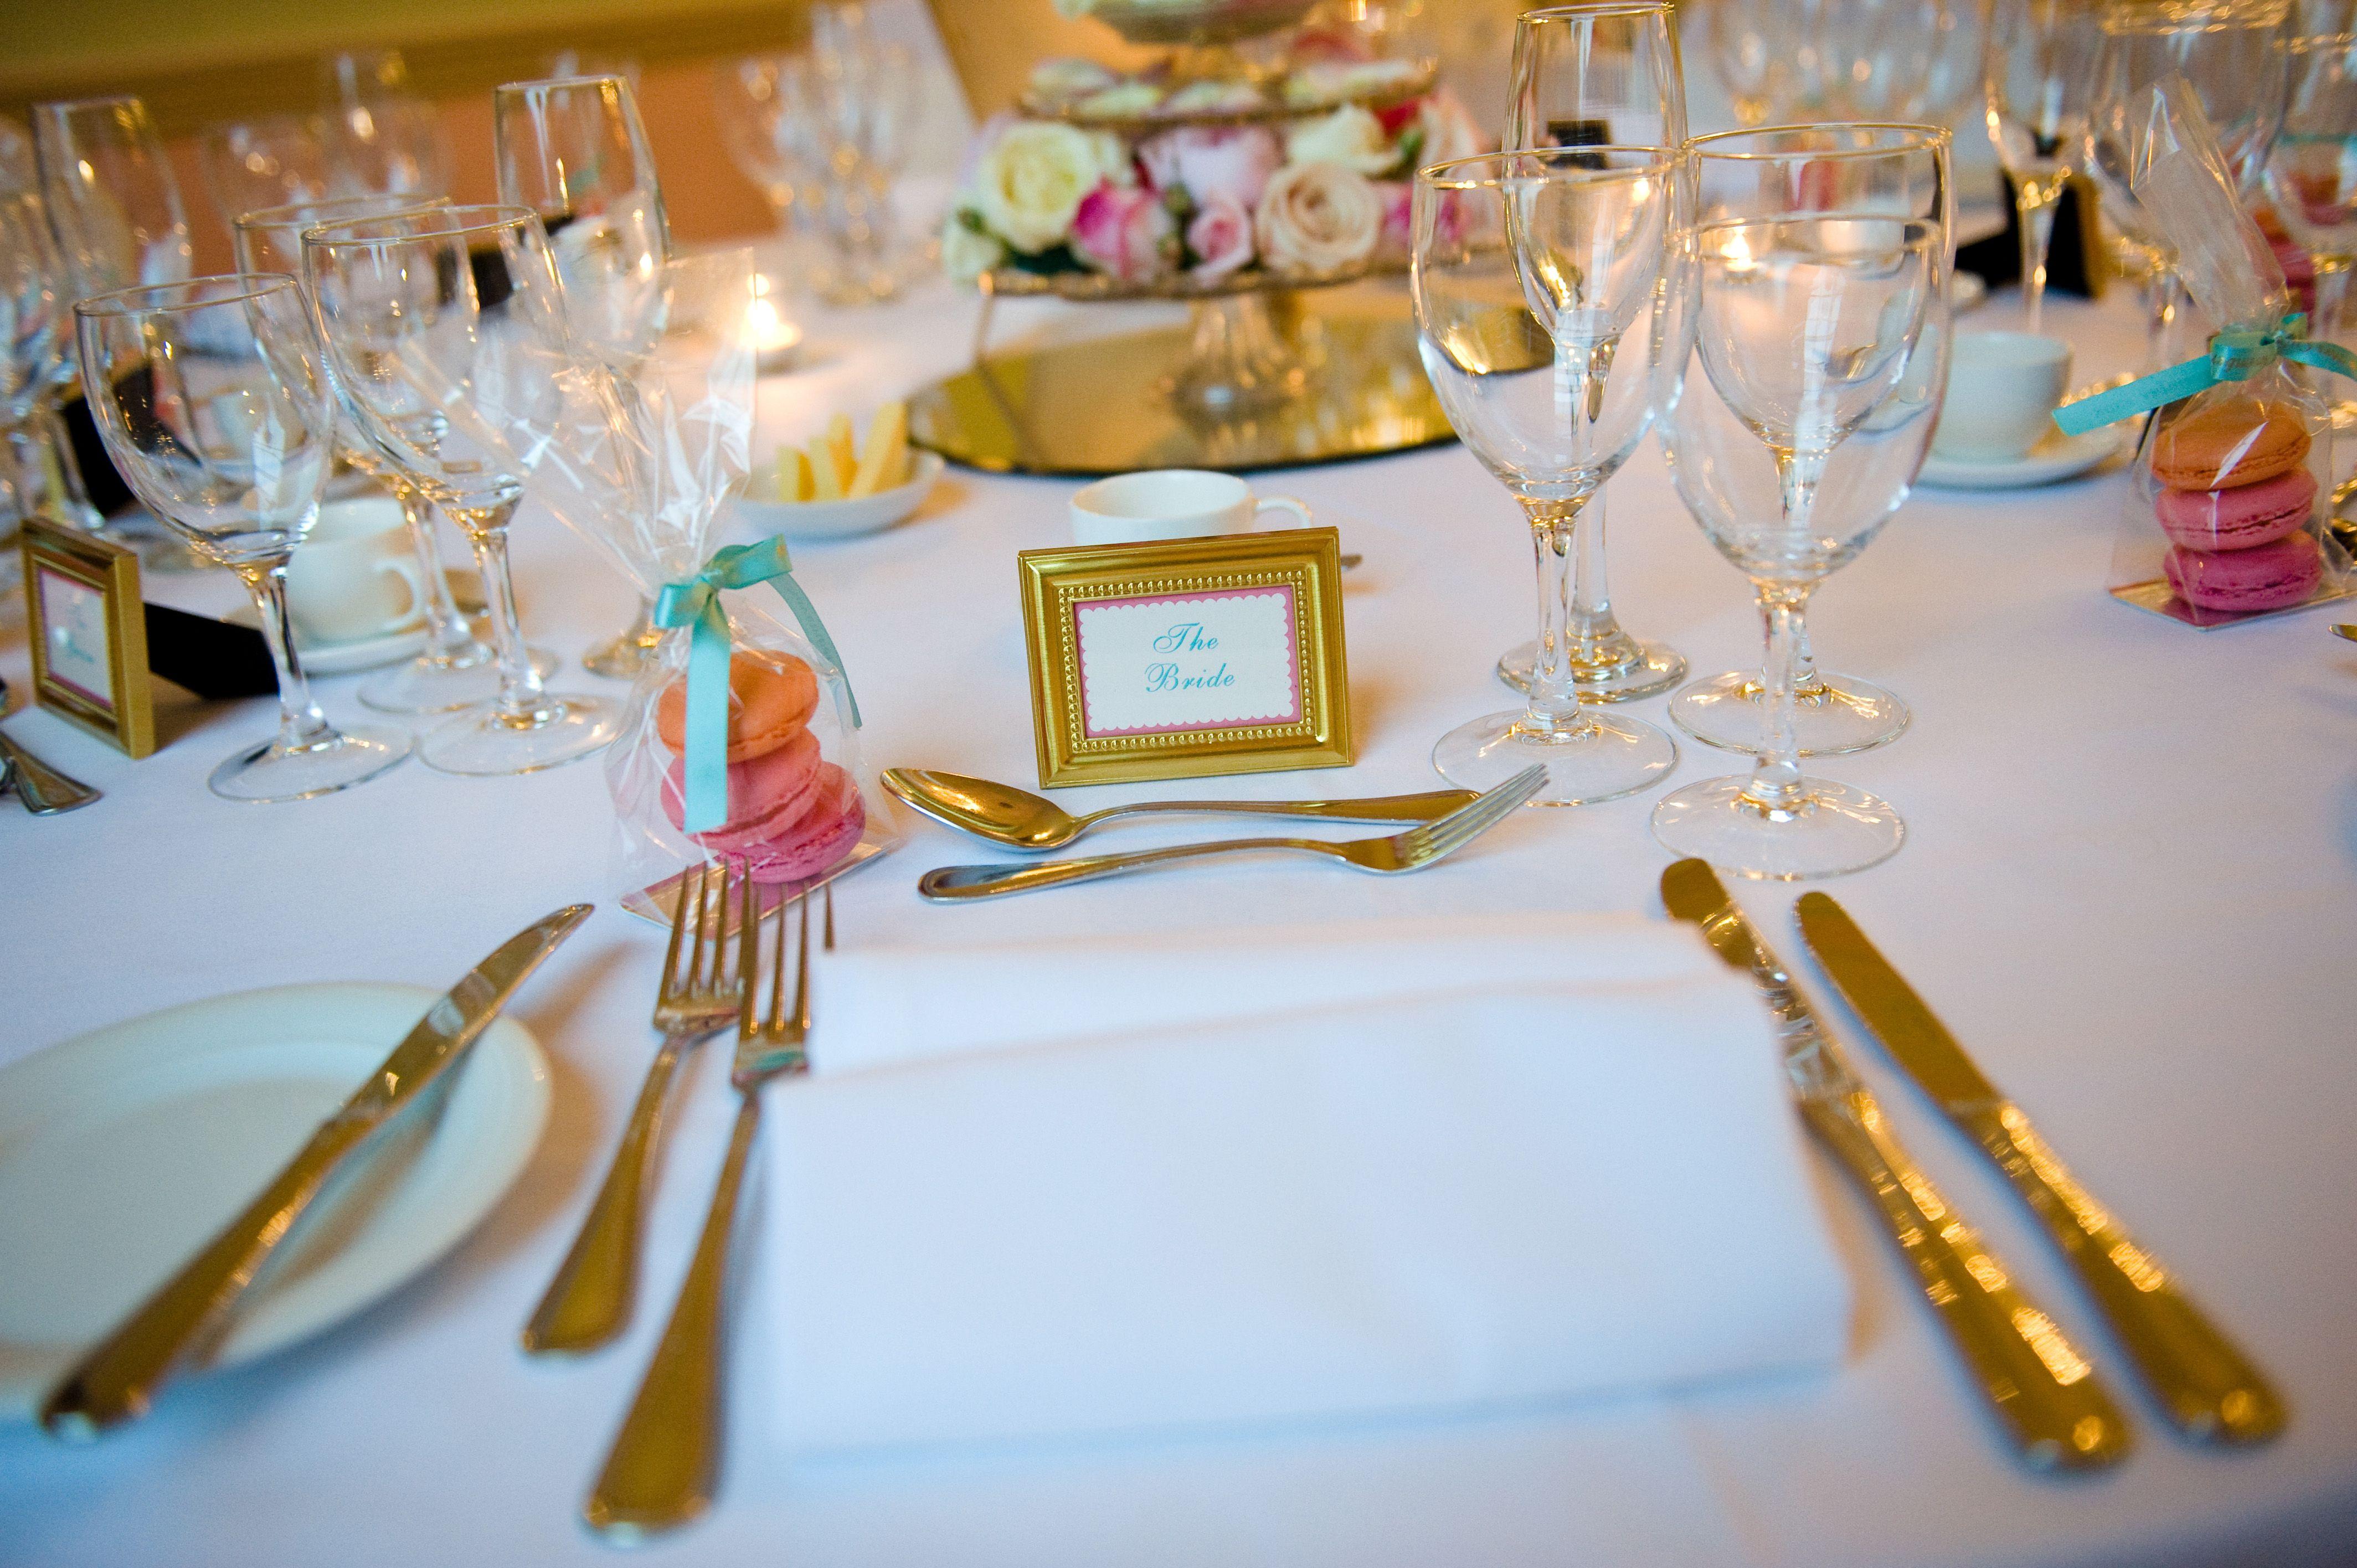 #Beautiful #Wedding #Table #Setup #Gold #Gorgeous